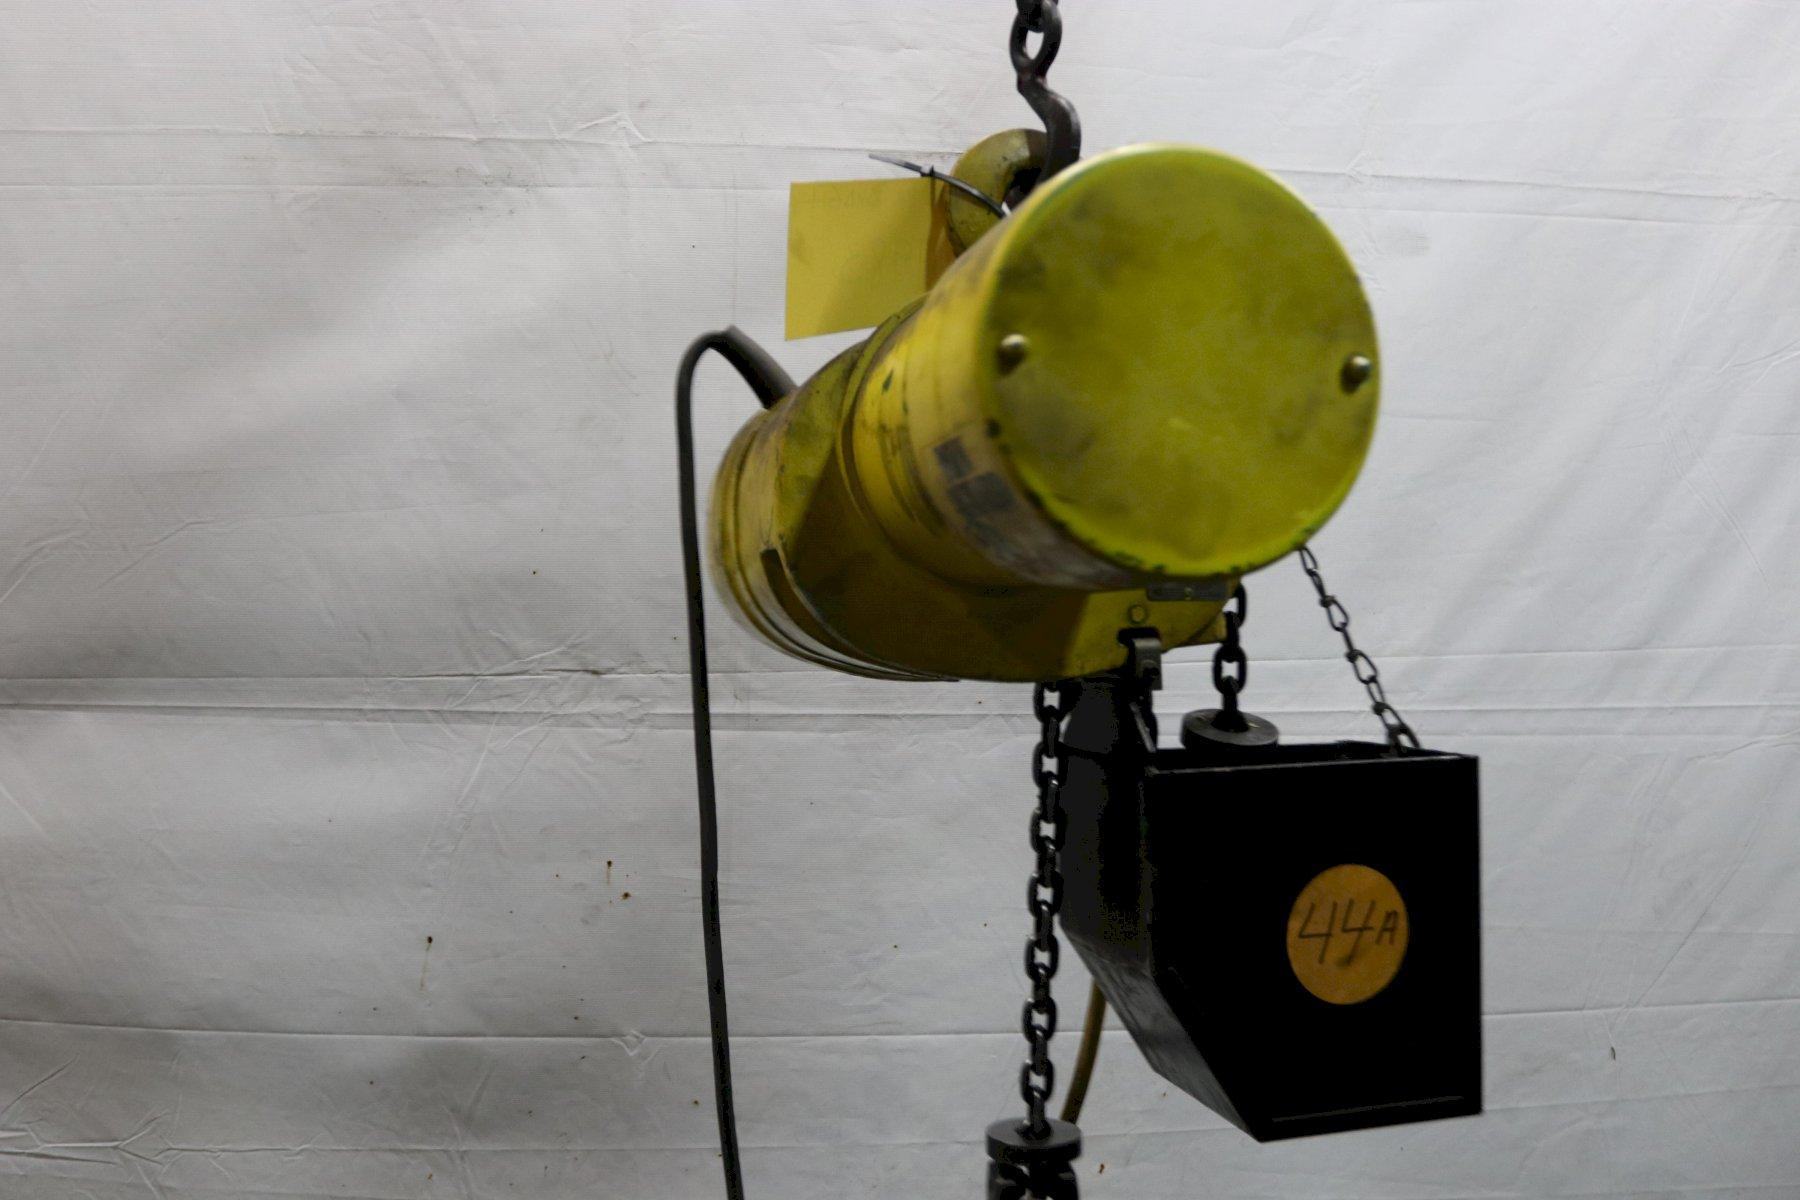 500 LB BUDGIT ELECTRIC POWERED CHAIN HOIST: STOCK #11983